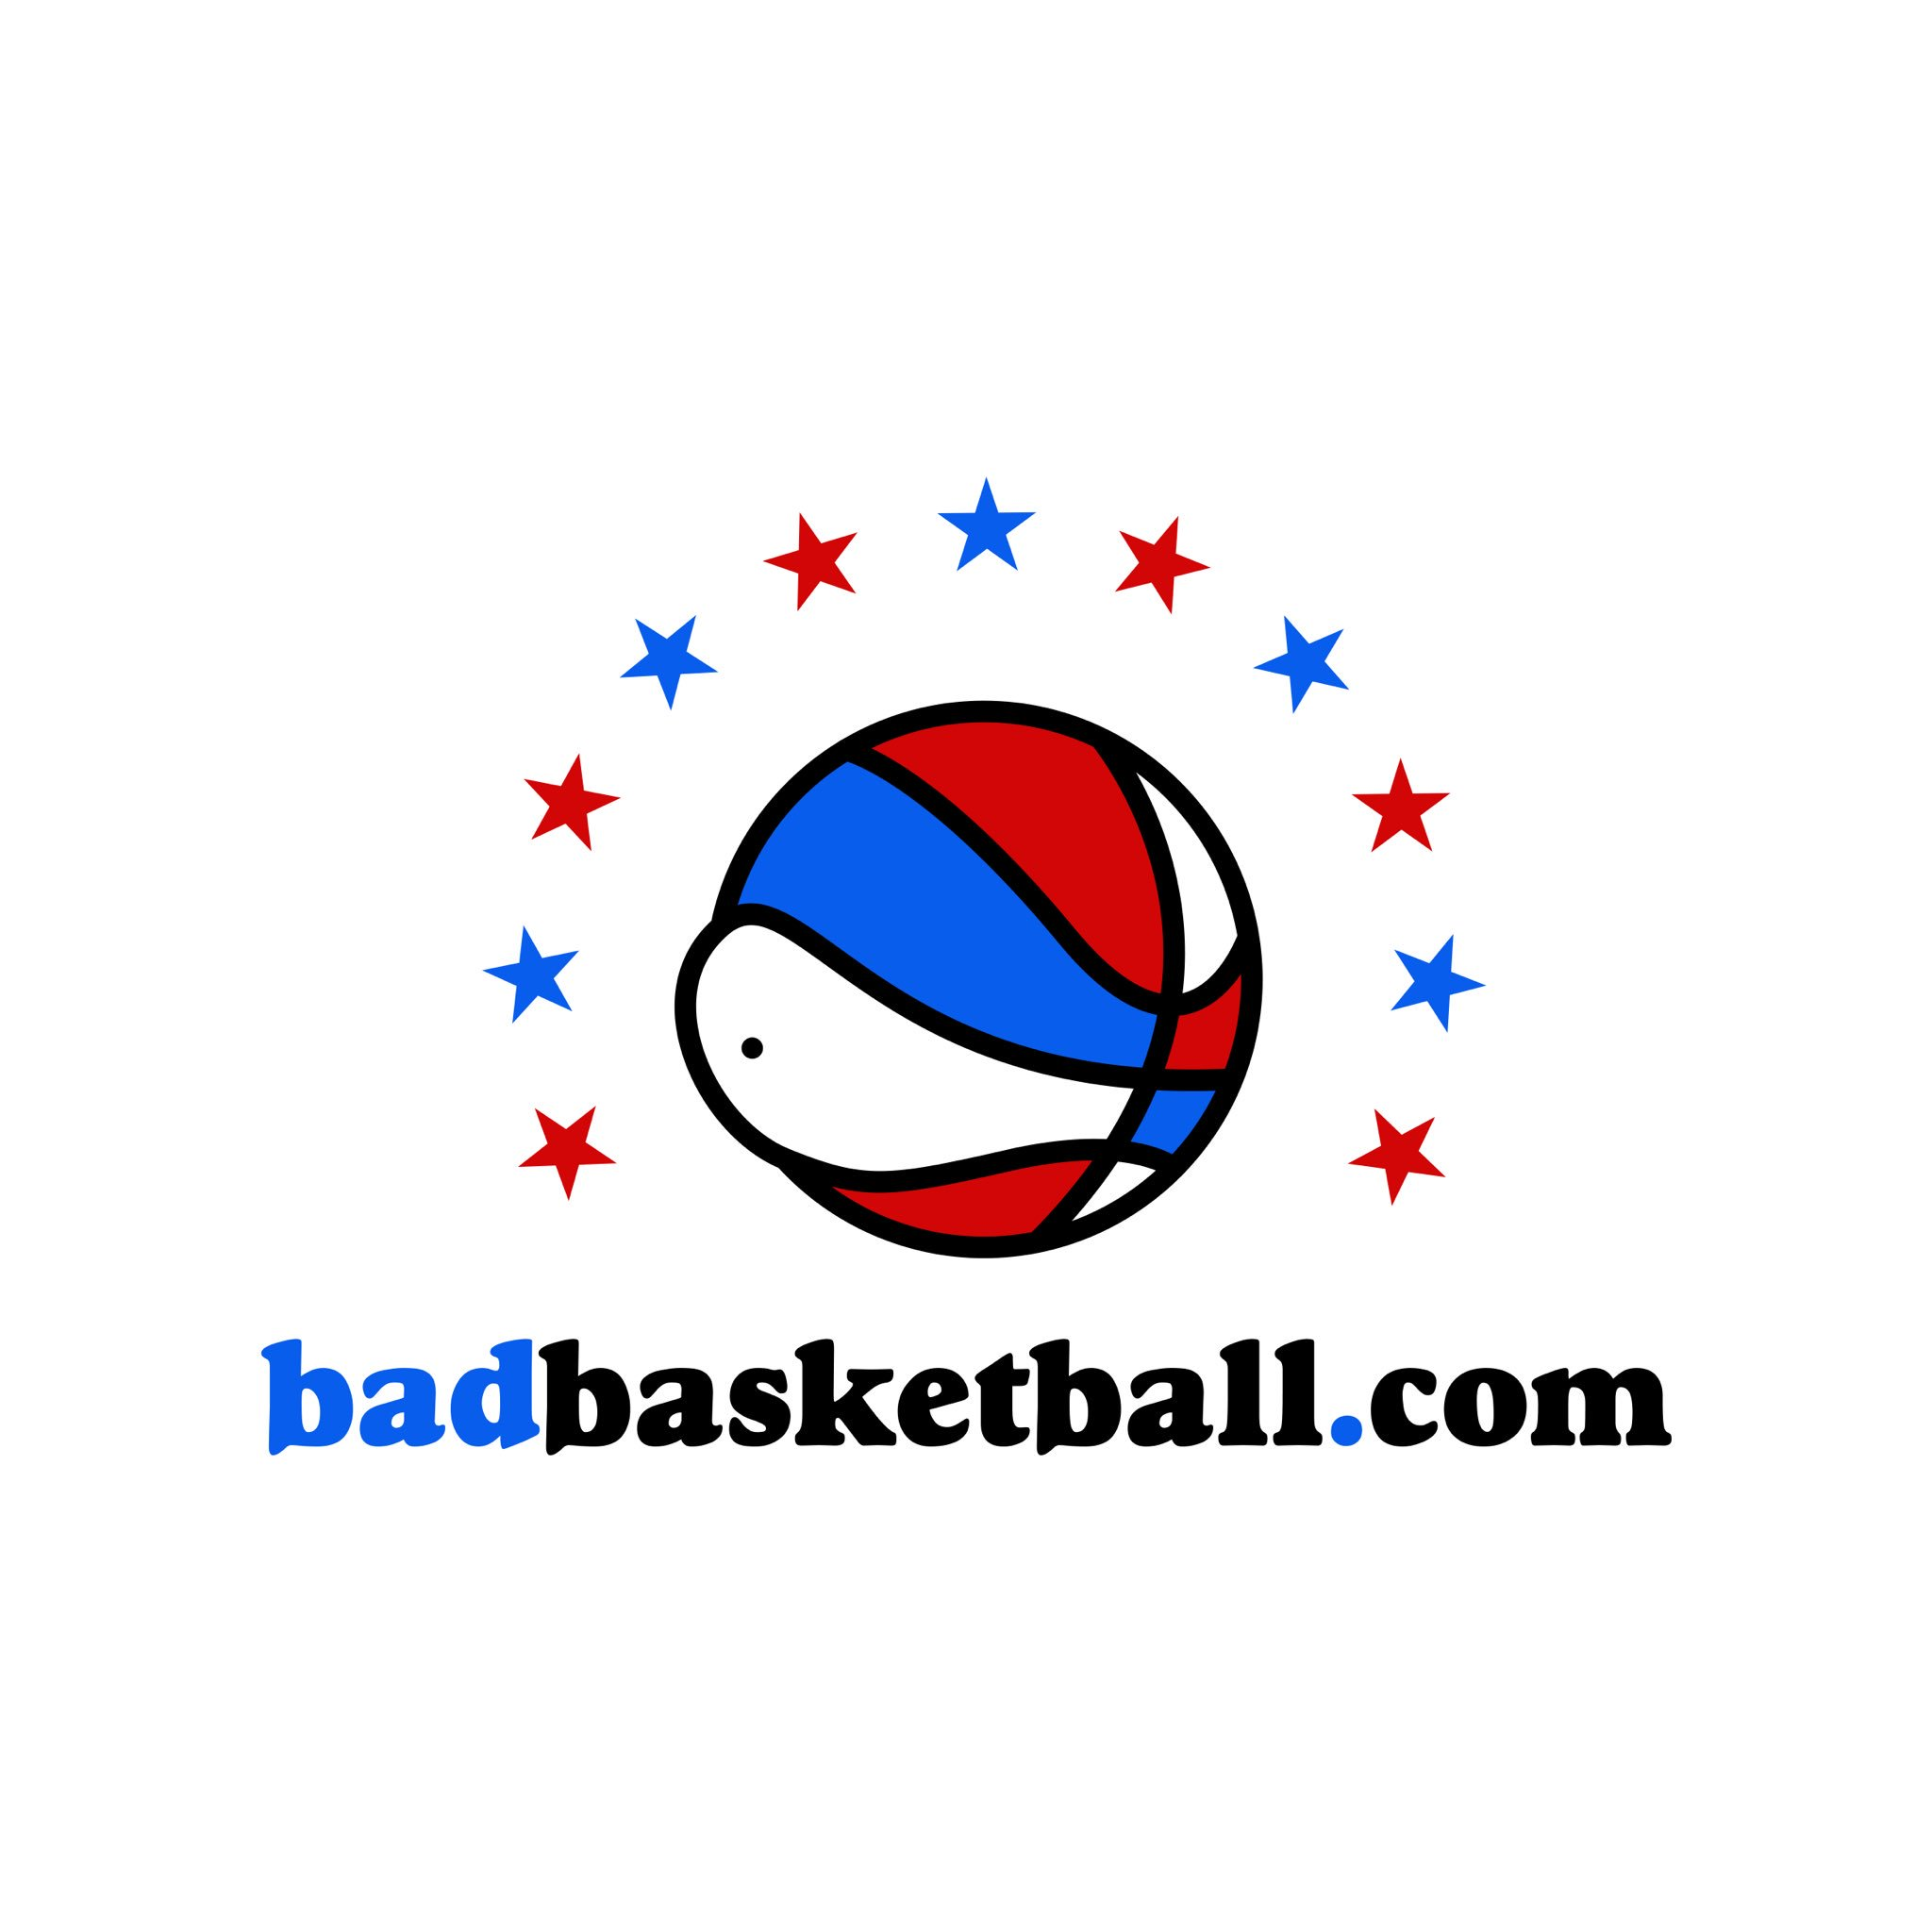 Bad Basketball logo